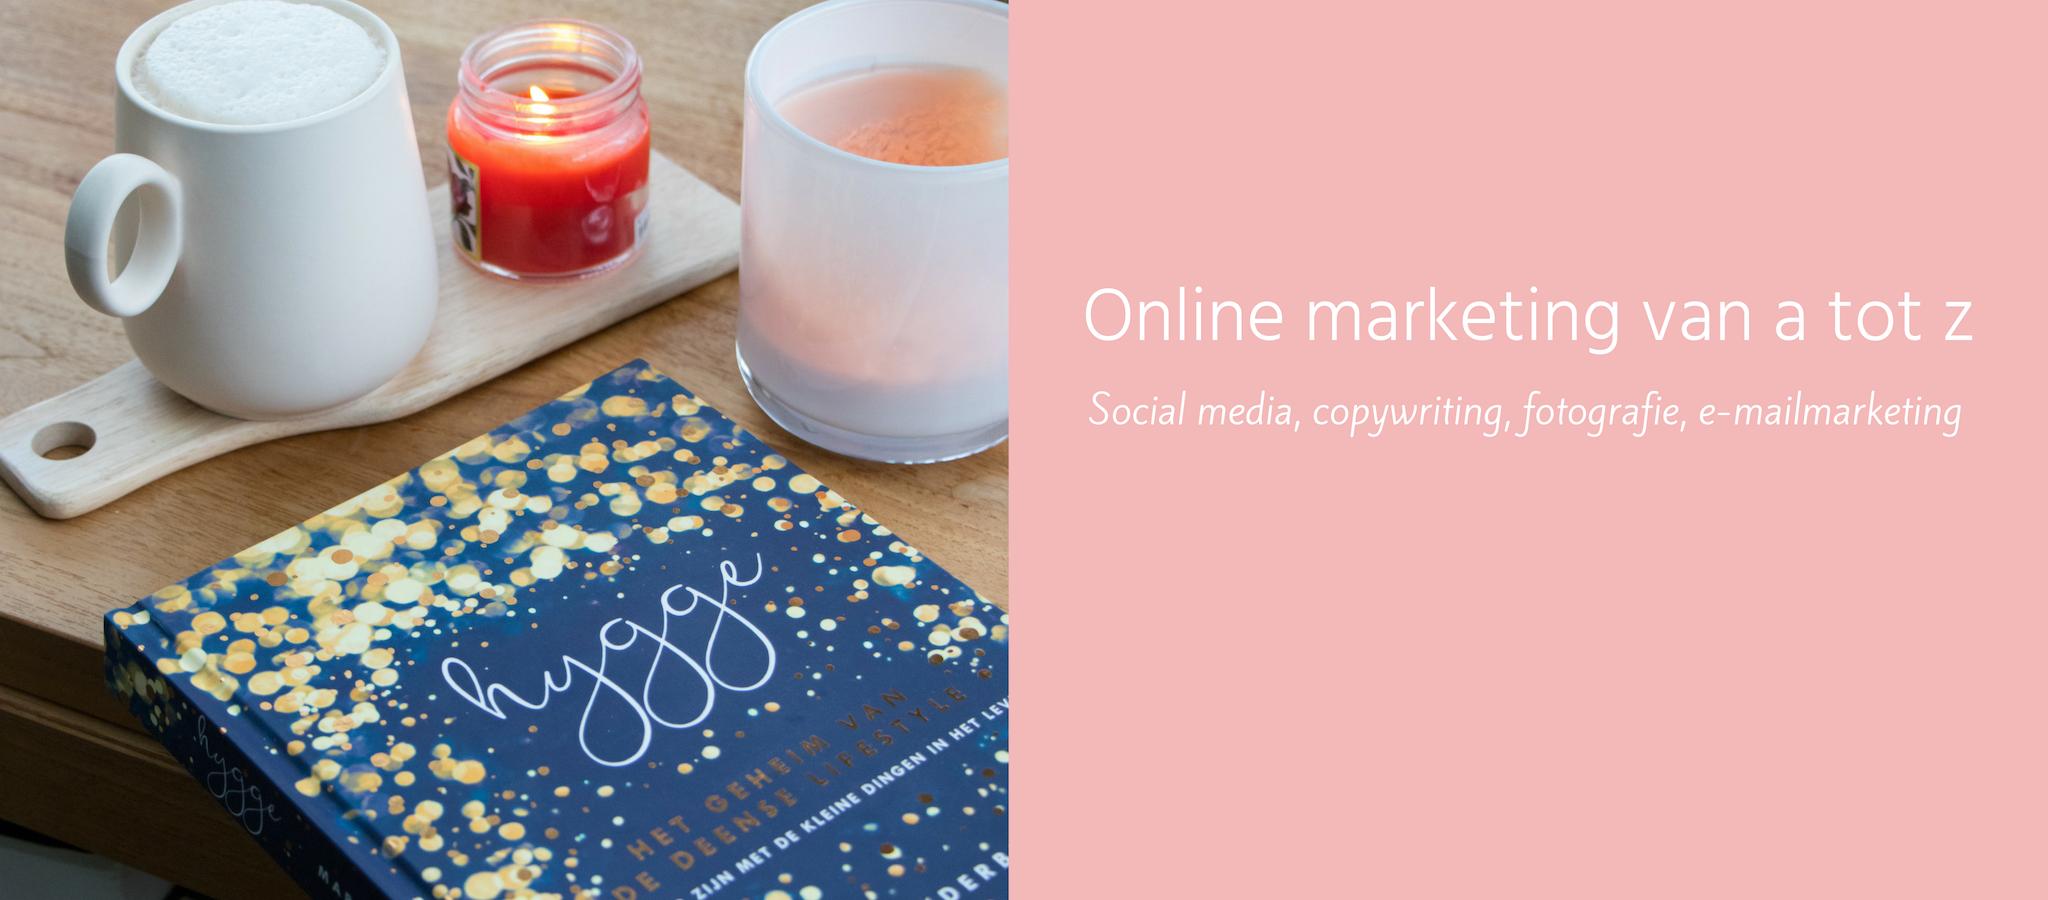 Besteed jouw online marketing uit freelance online marketing specialist